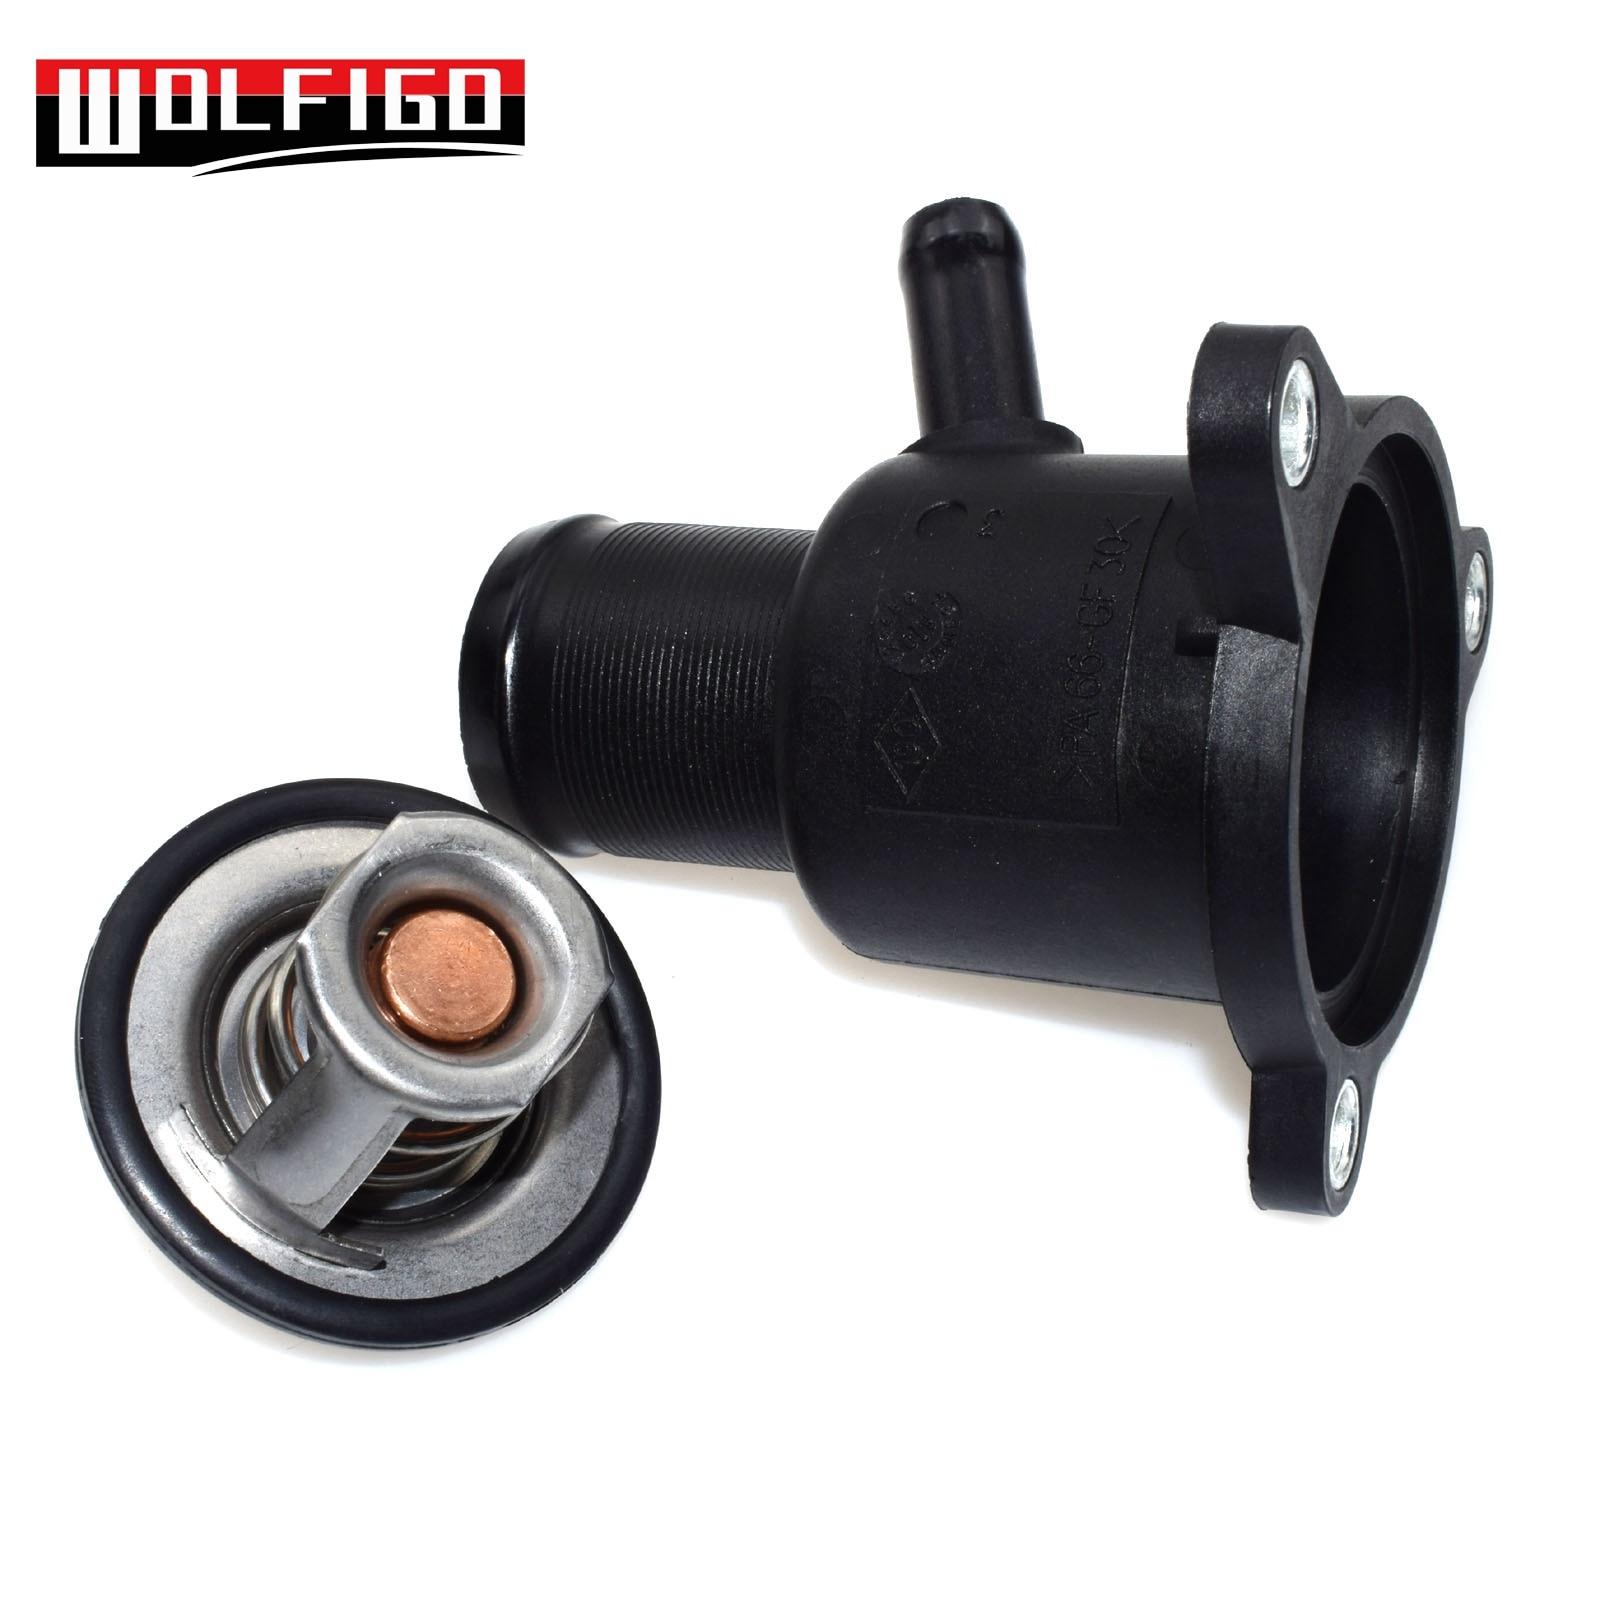 wolfigo new engine coolant thermostat w gasket 902 954 fit nissan renault clio ii kangoo dacia duster 8200561420 7700101179 [ 1600 x 1600 Pixel ]